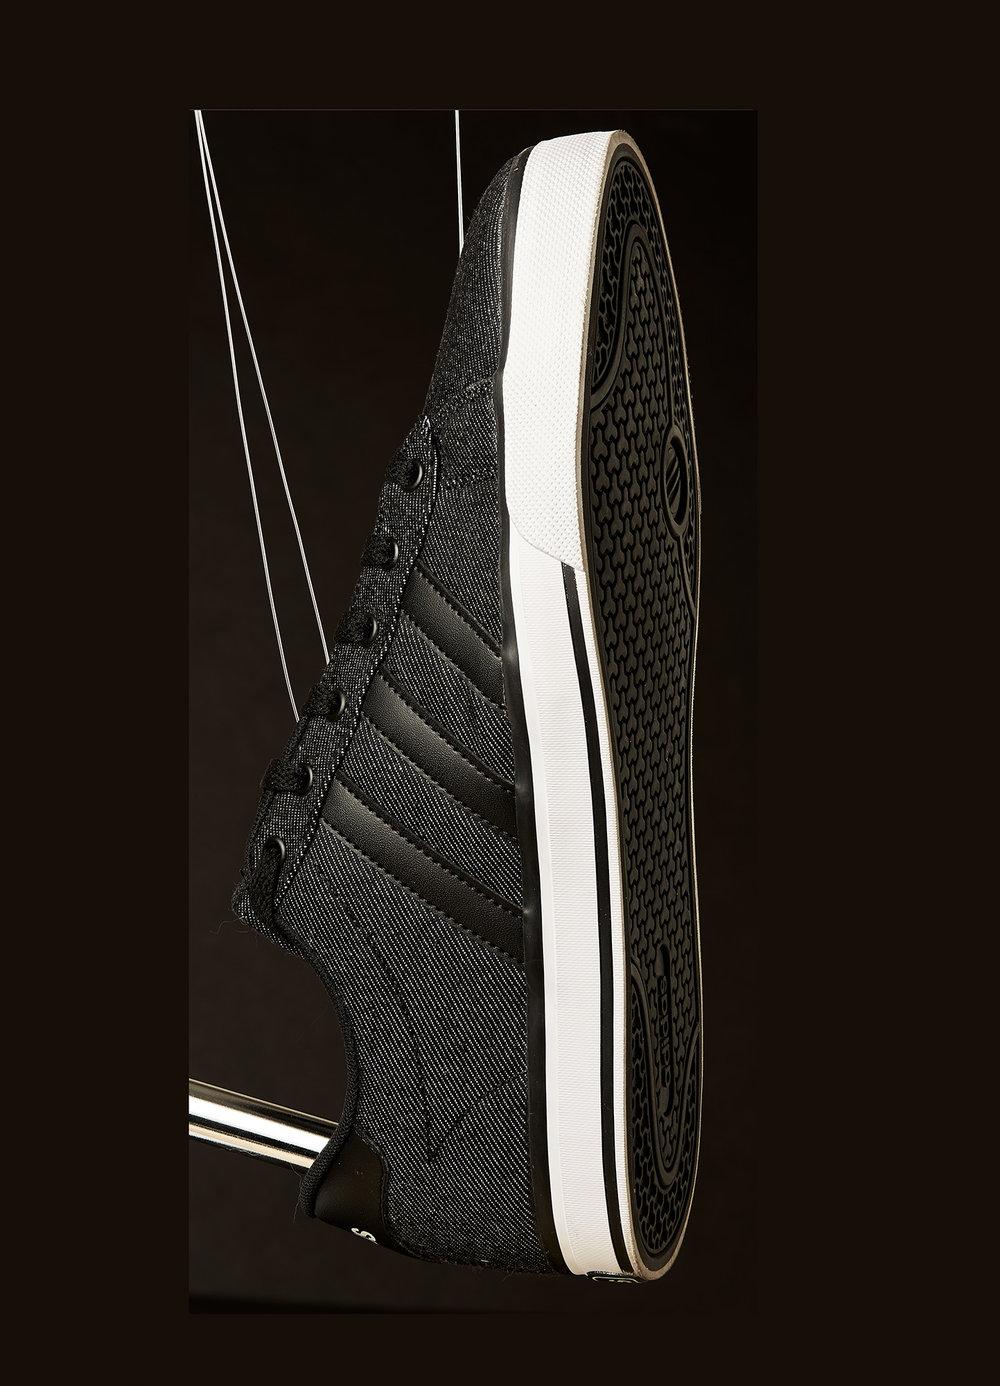 shoe before.jpg